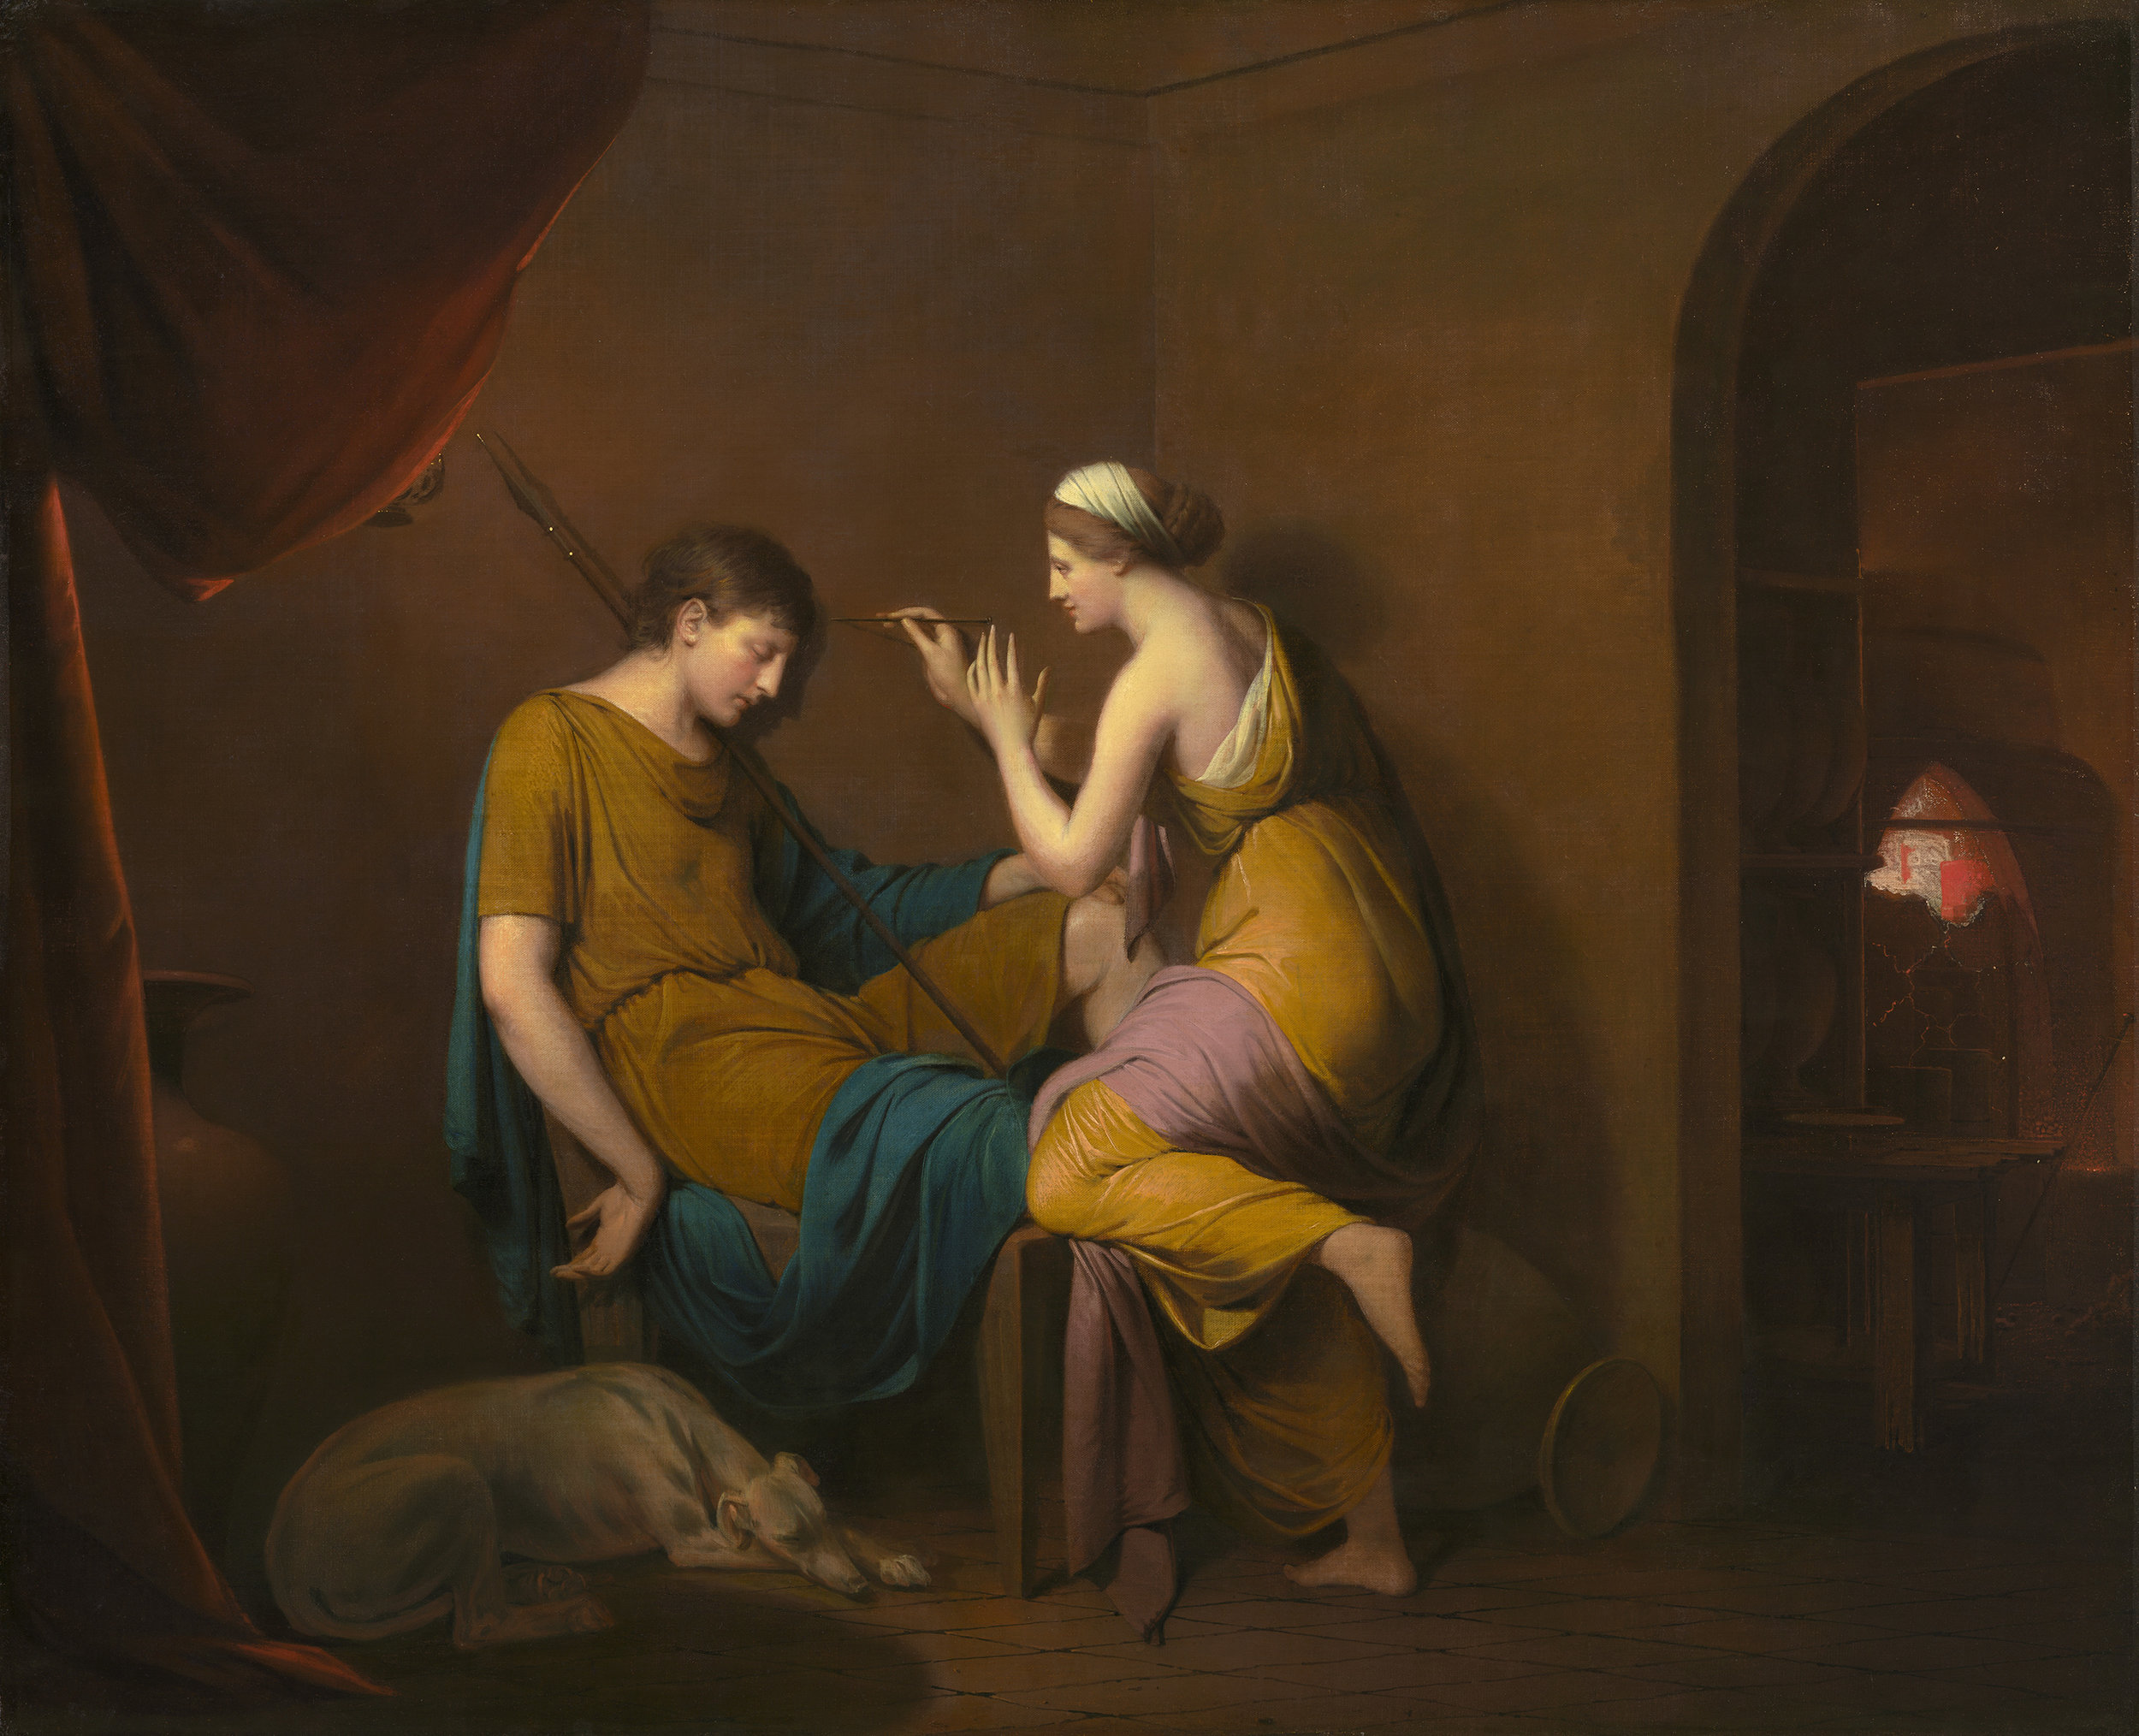 Joseph Wright of Derby, The Corinthian Maid, 1782–1784